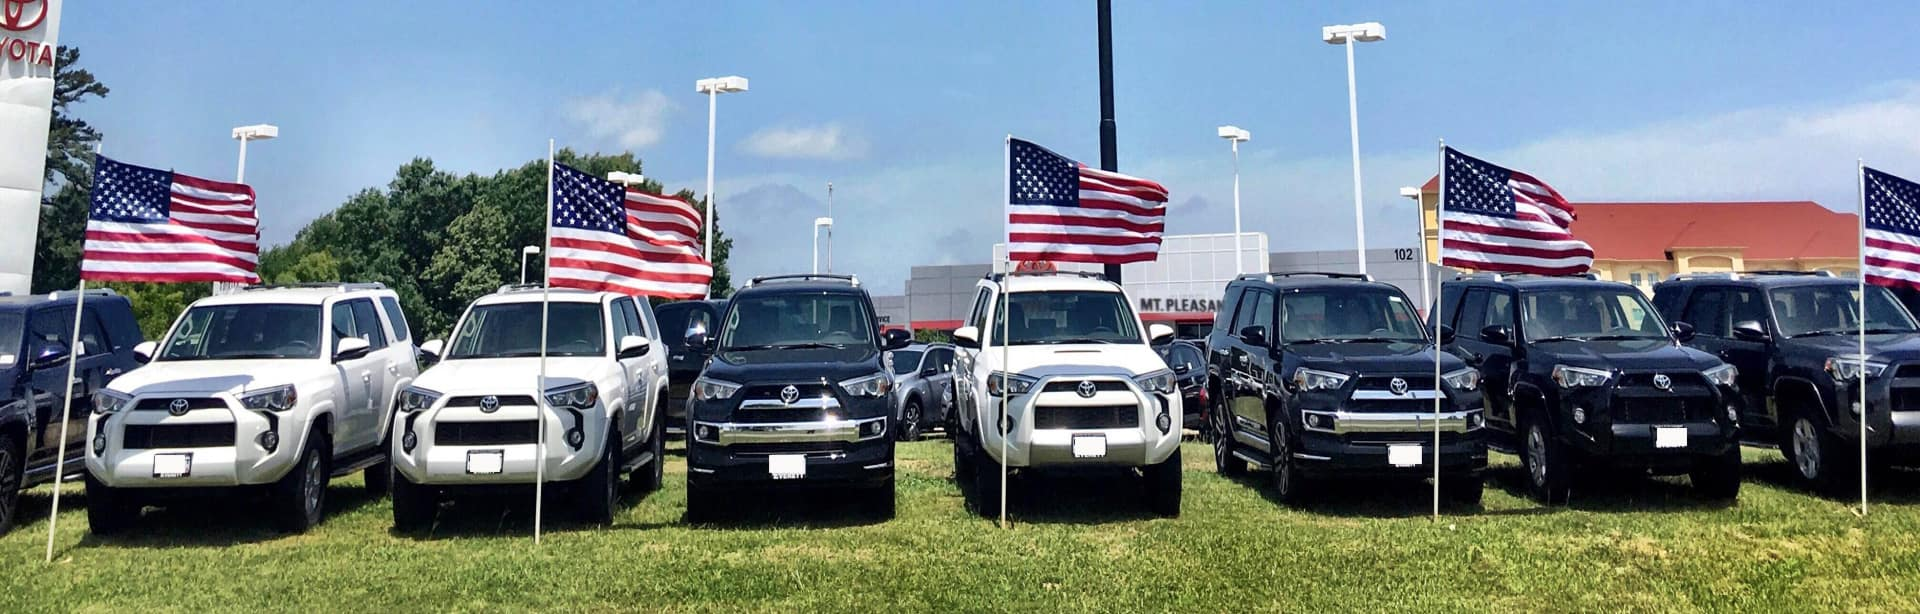 Car Dealerships In Longview Tx >> Toyota Of Mt Pleasant Toyota Dealer In Mt Pleasant Tx